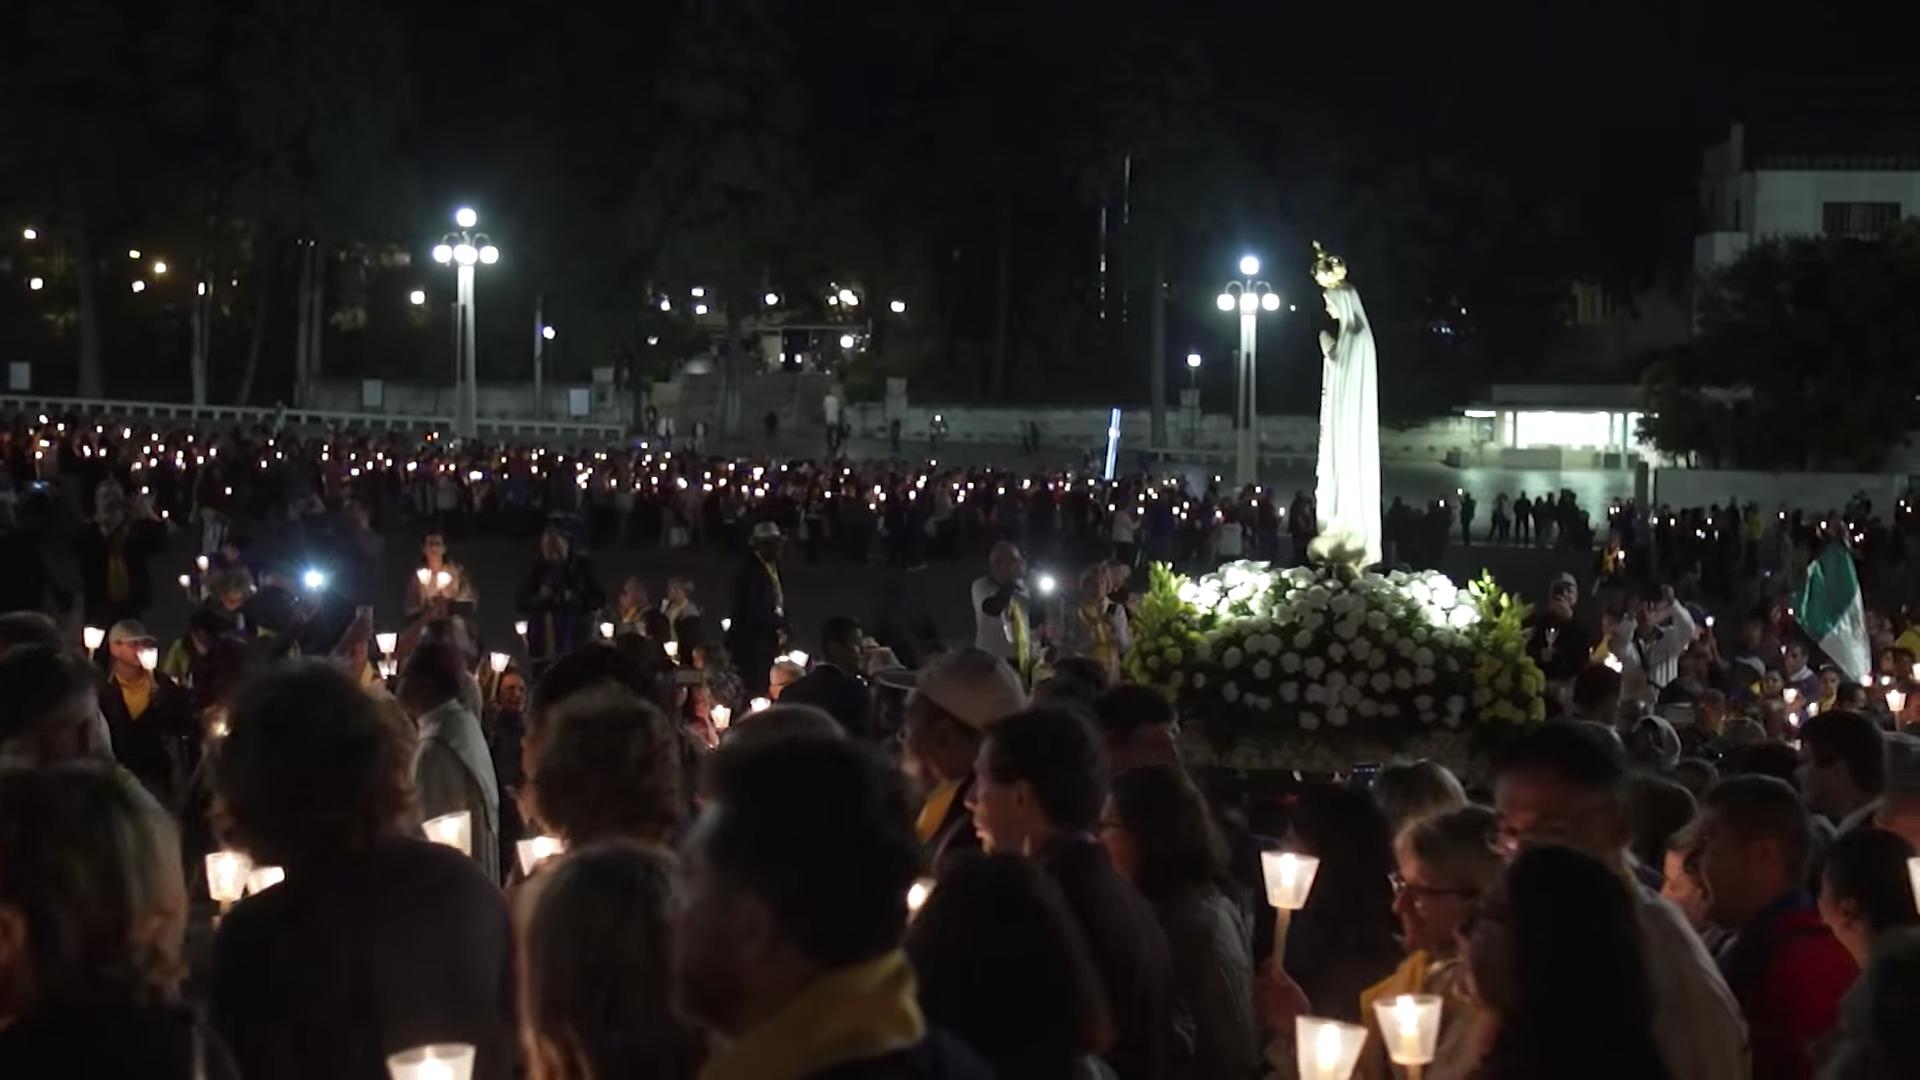 Equipes Notre-Dame, Fatima 2018, capture @YouTube